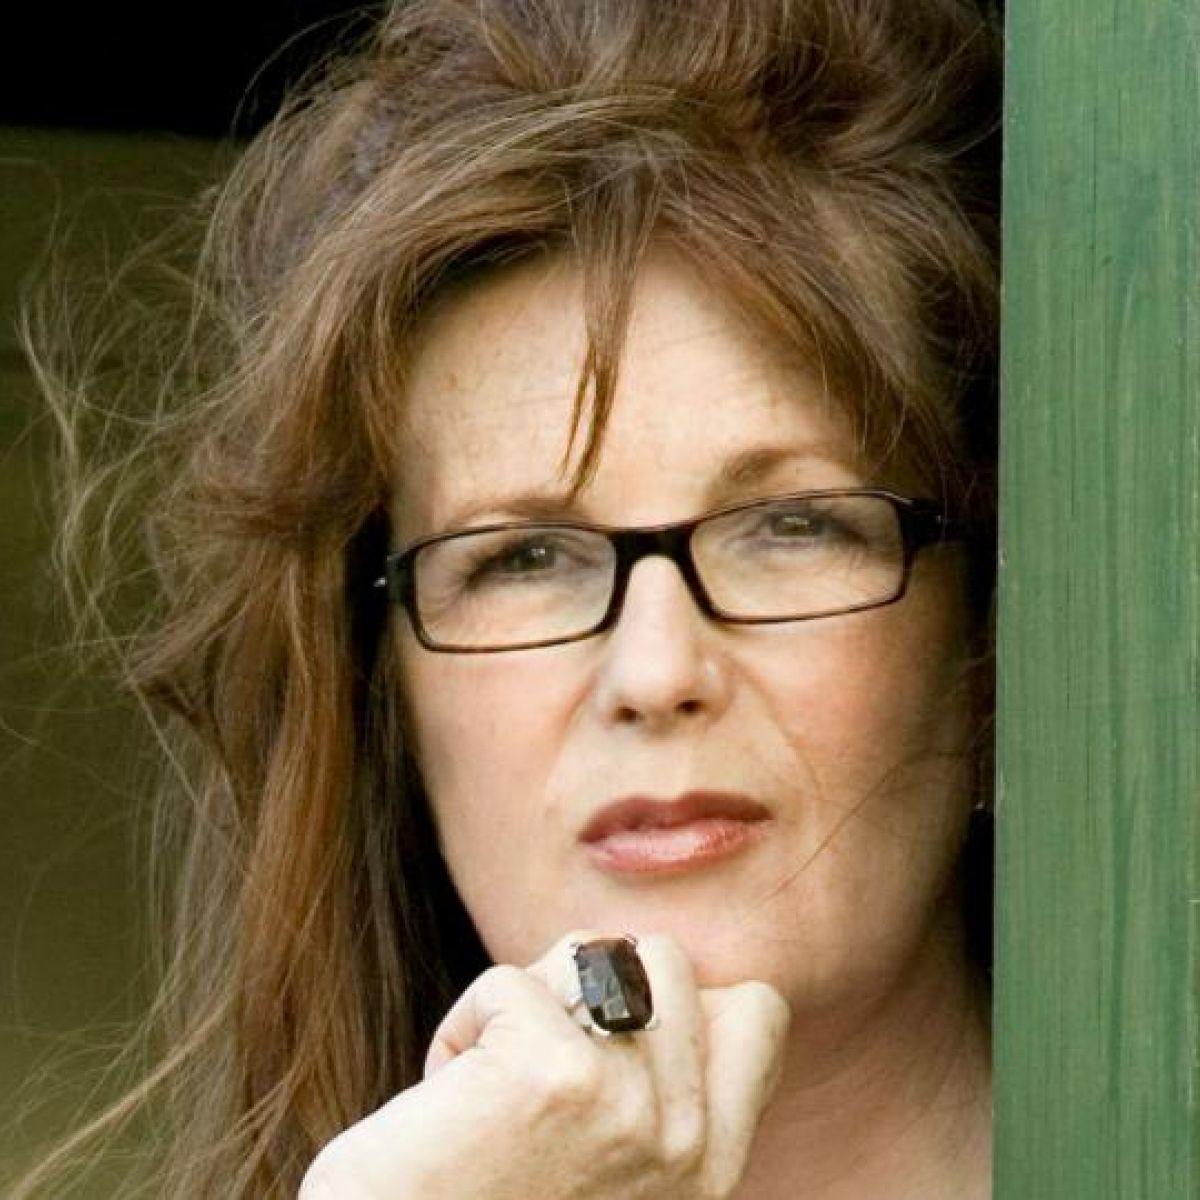 Christine Dwyer Hickey Qa My Influences From Mrs Dalloway To Janice Galloway